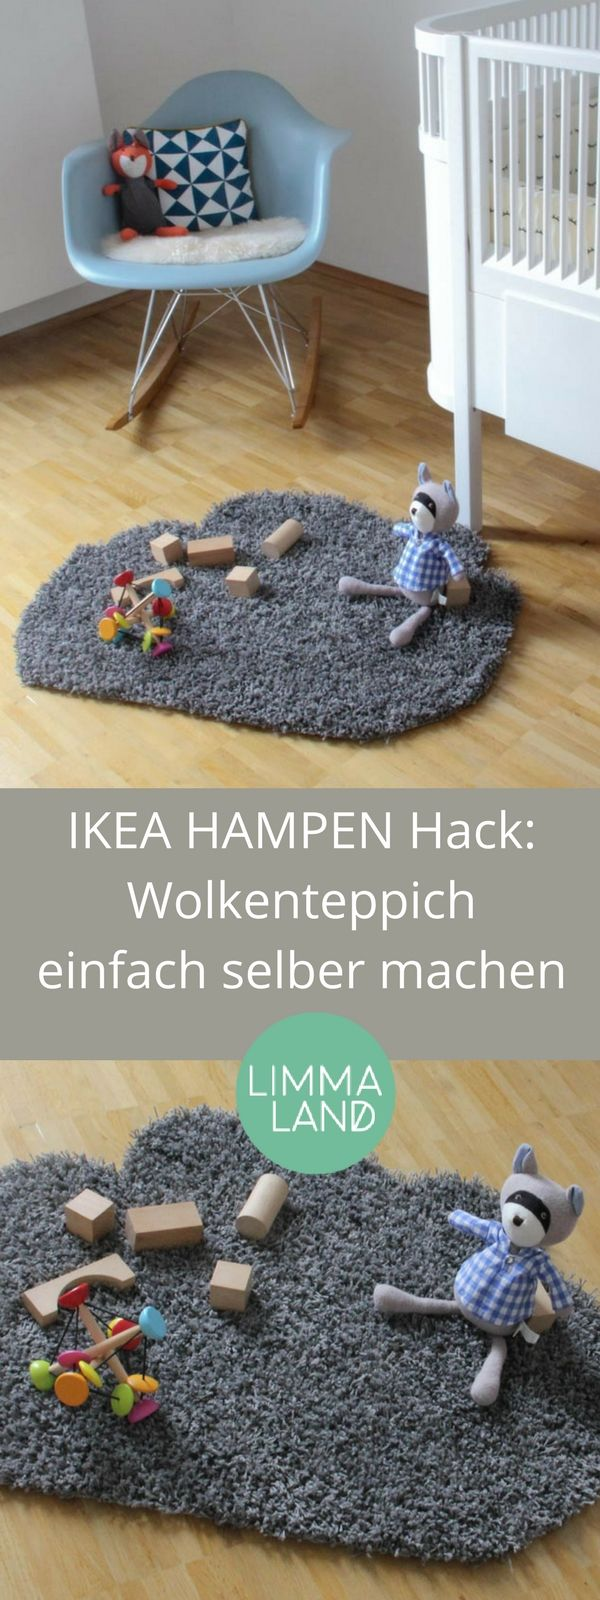 Cute IKEA HAMPEN Hack Wolkenteppich DIY